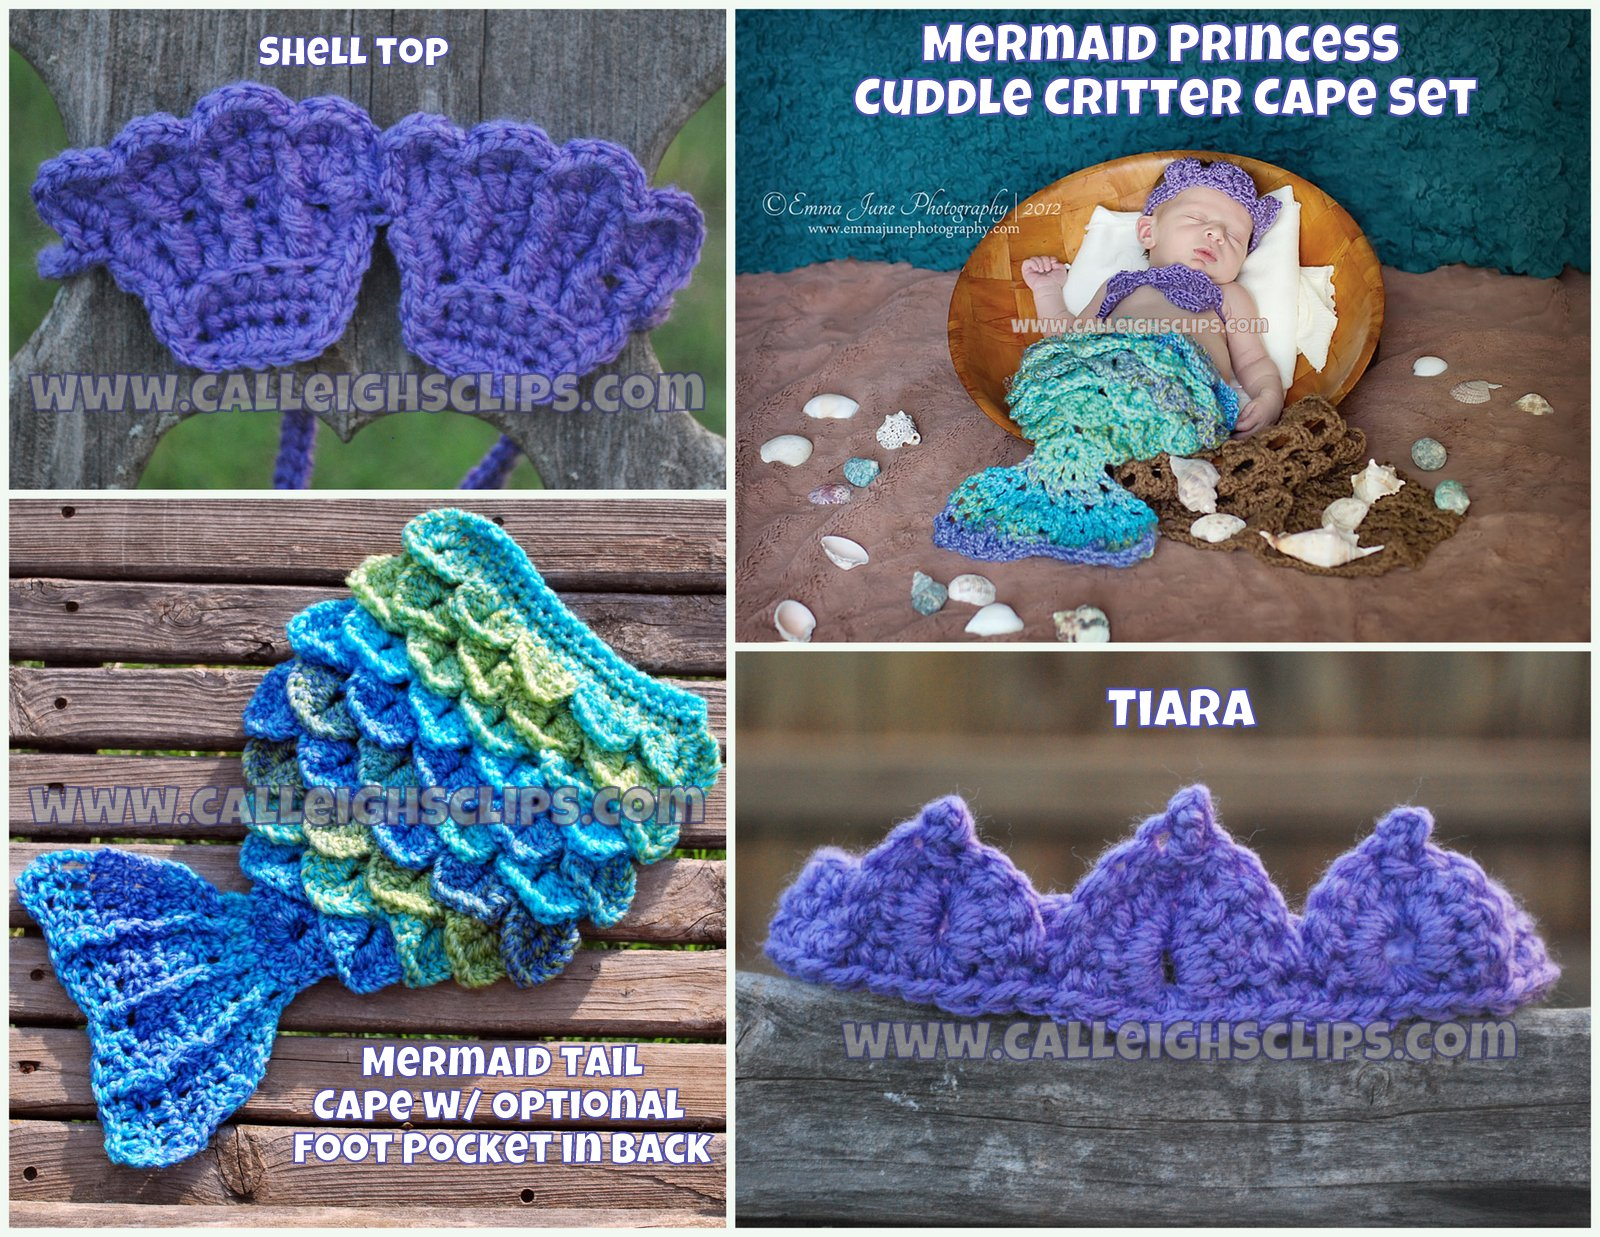 Calleighs Clips Crochet Creations Pre Sale Mermaid Princess